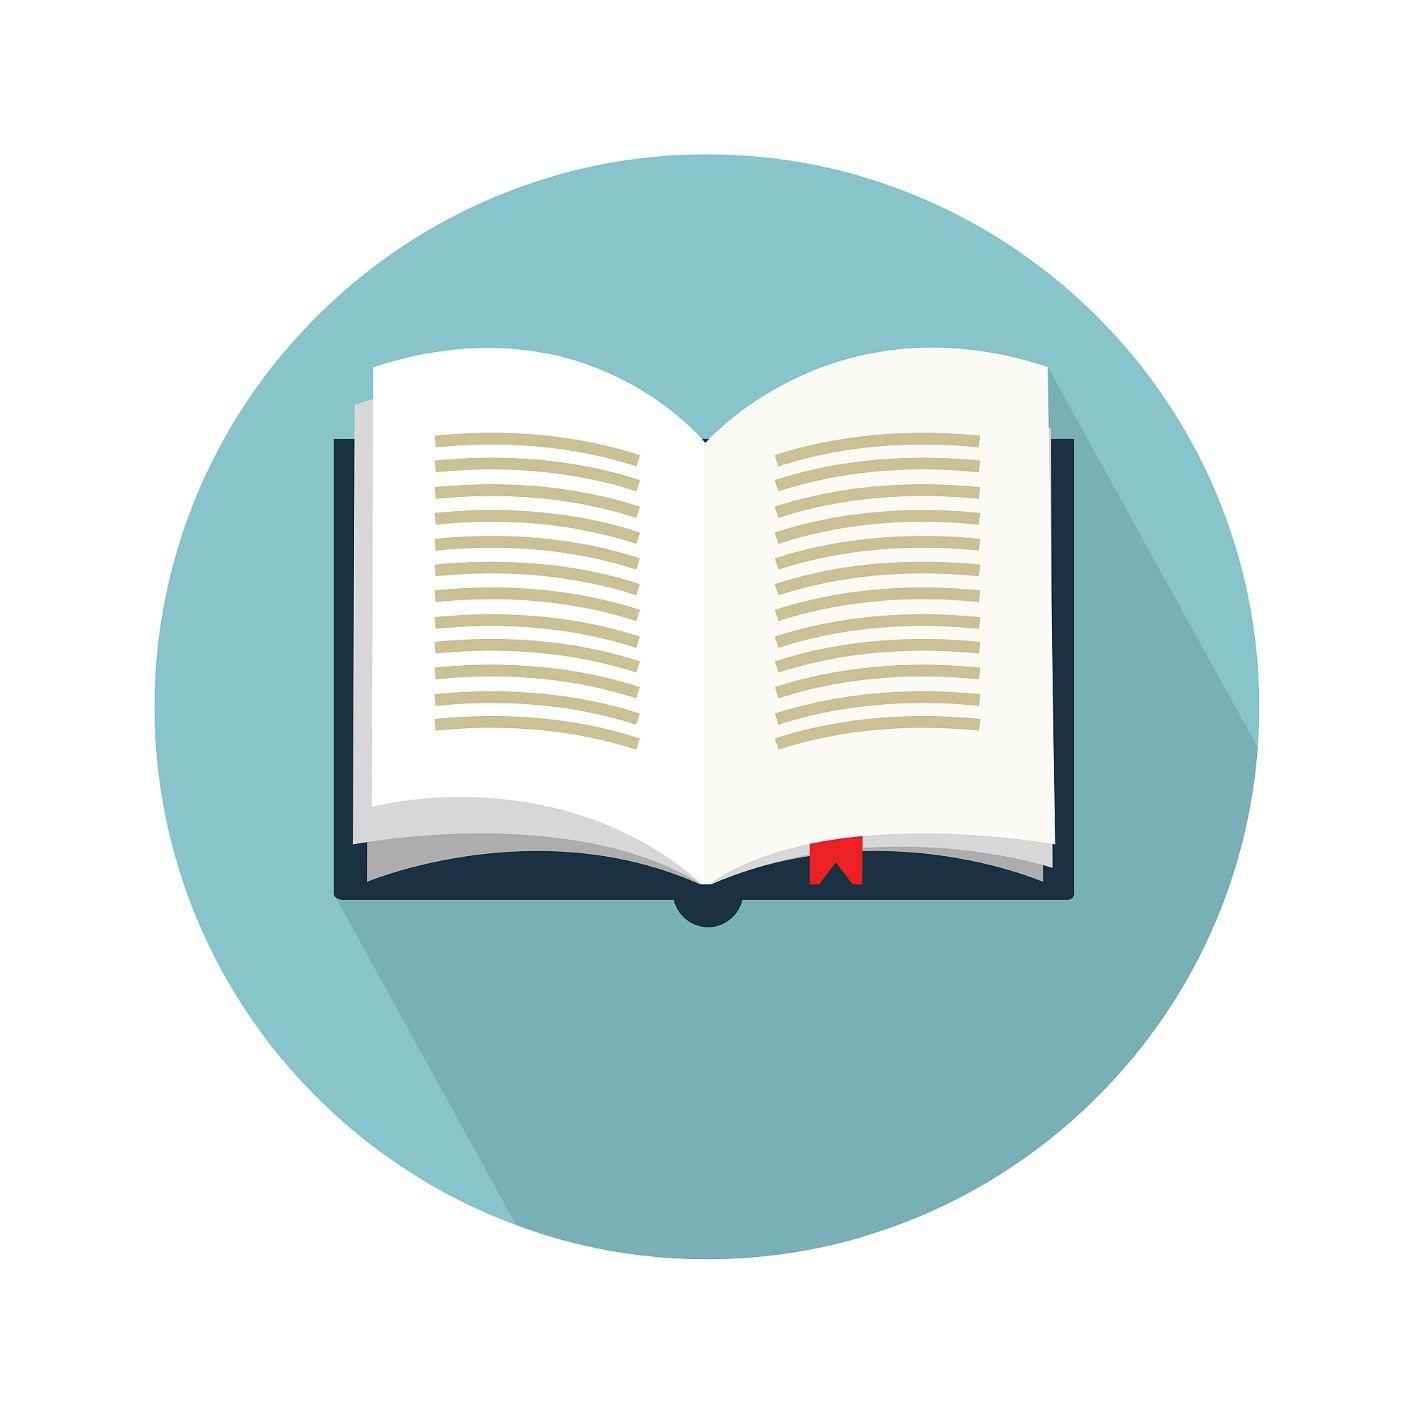 TECZKA EDUKACYJNA EDULATKI 3-LATEK